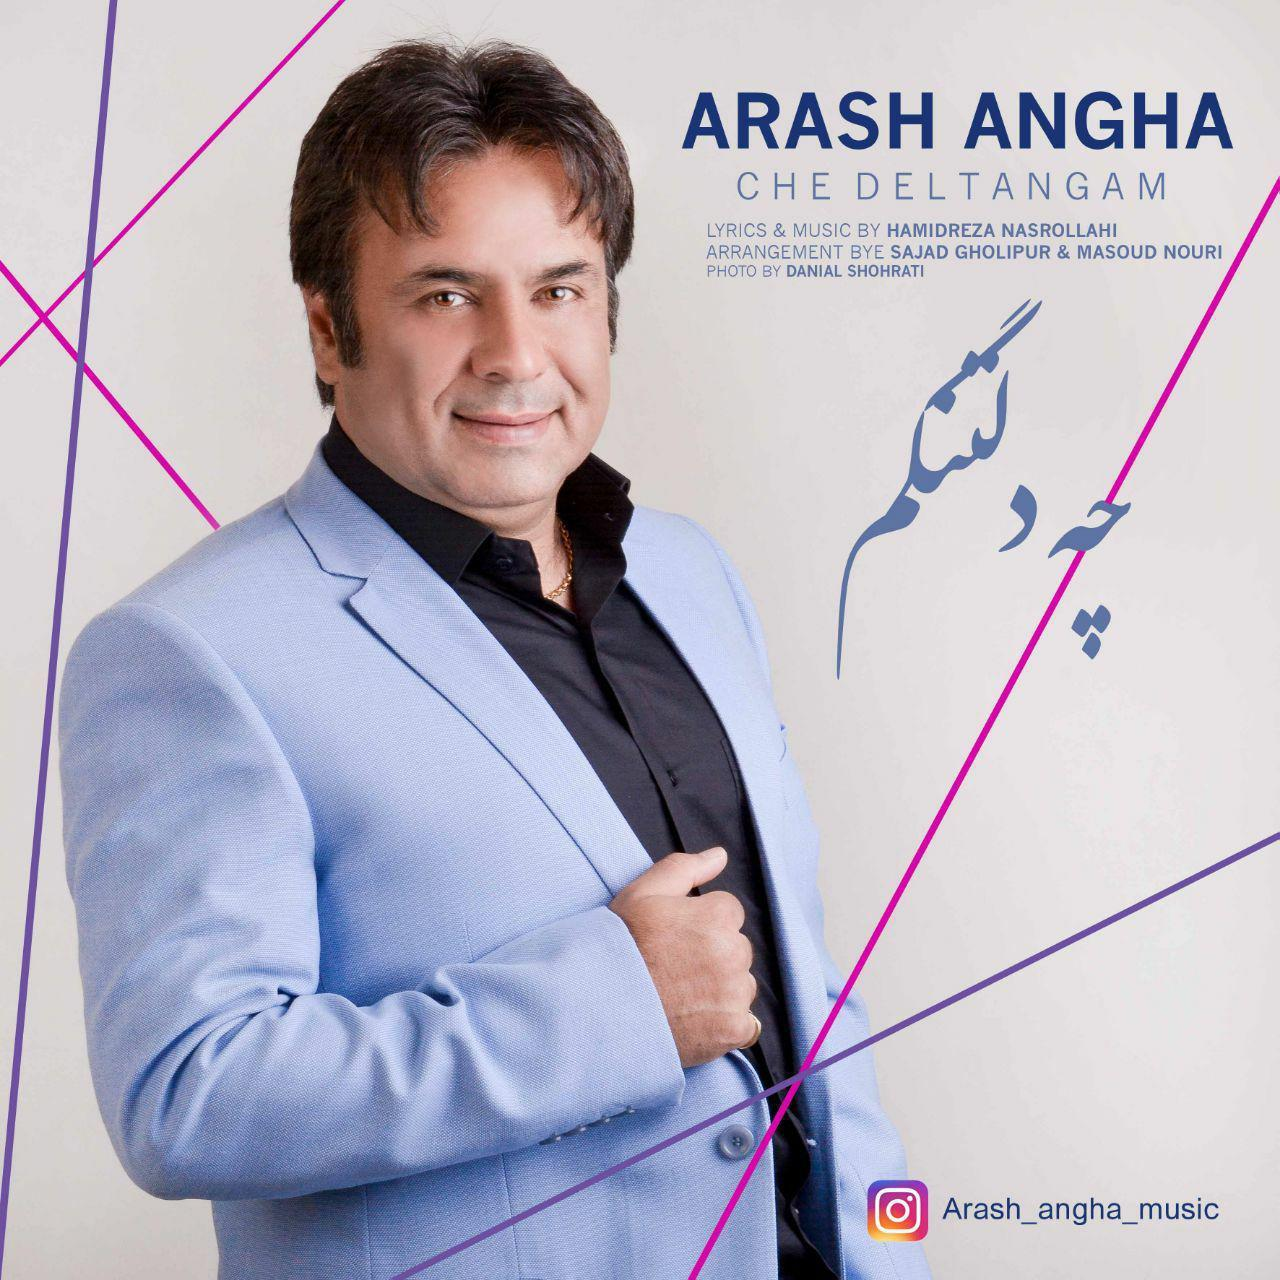 Arash Angha – Che Deltangam